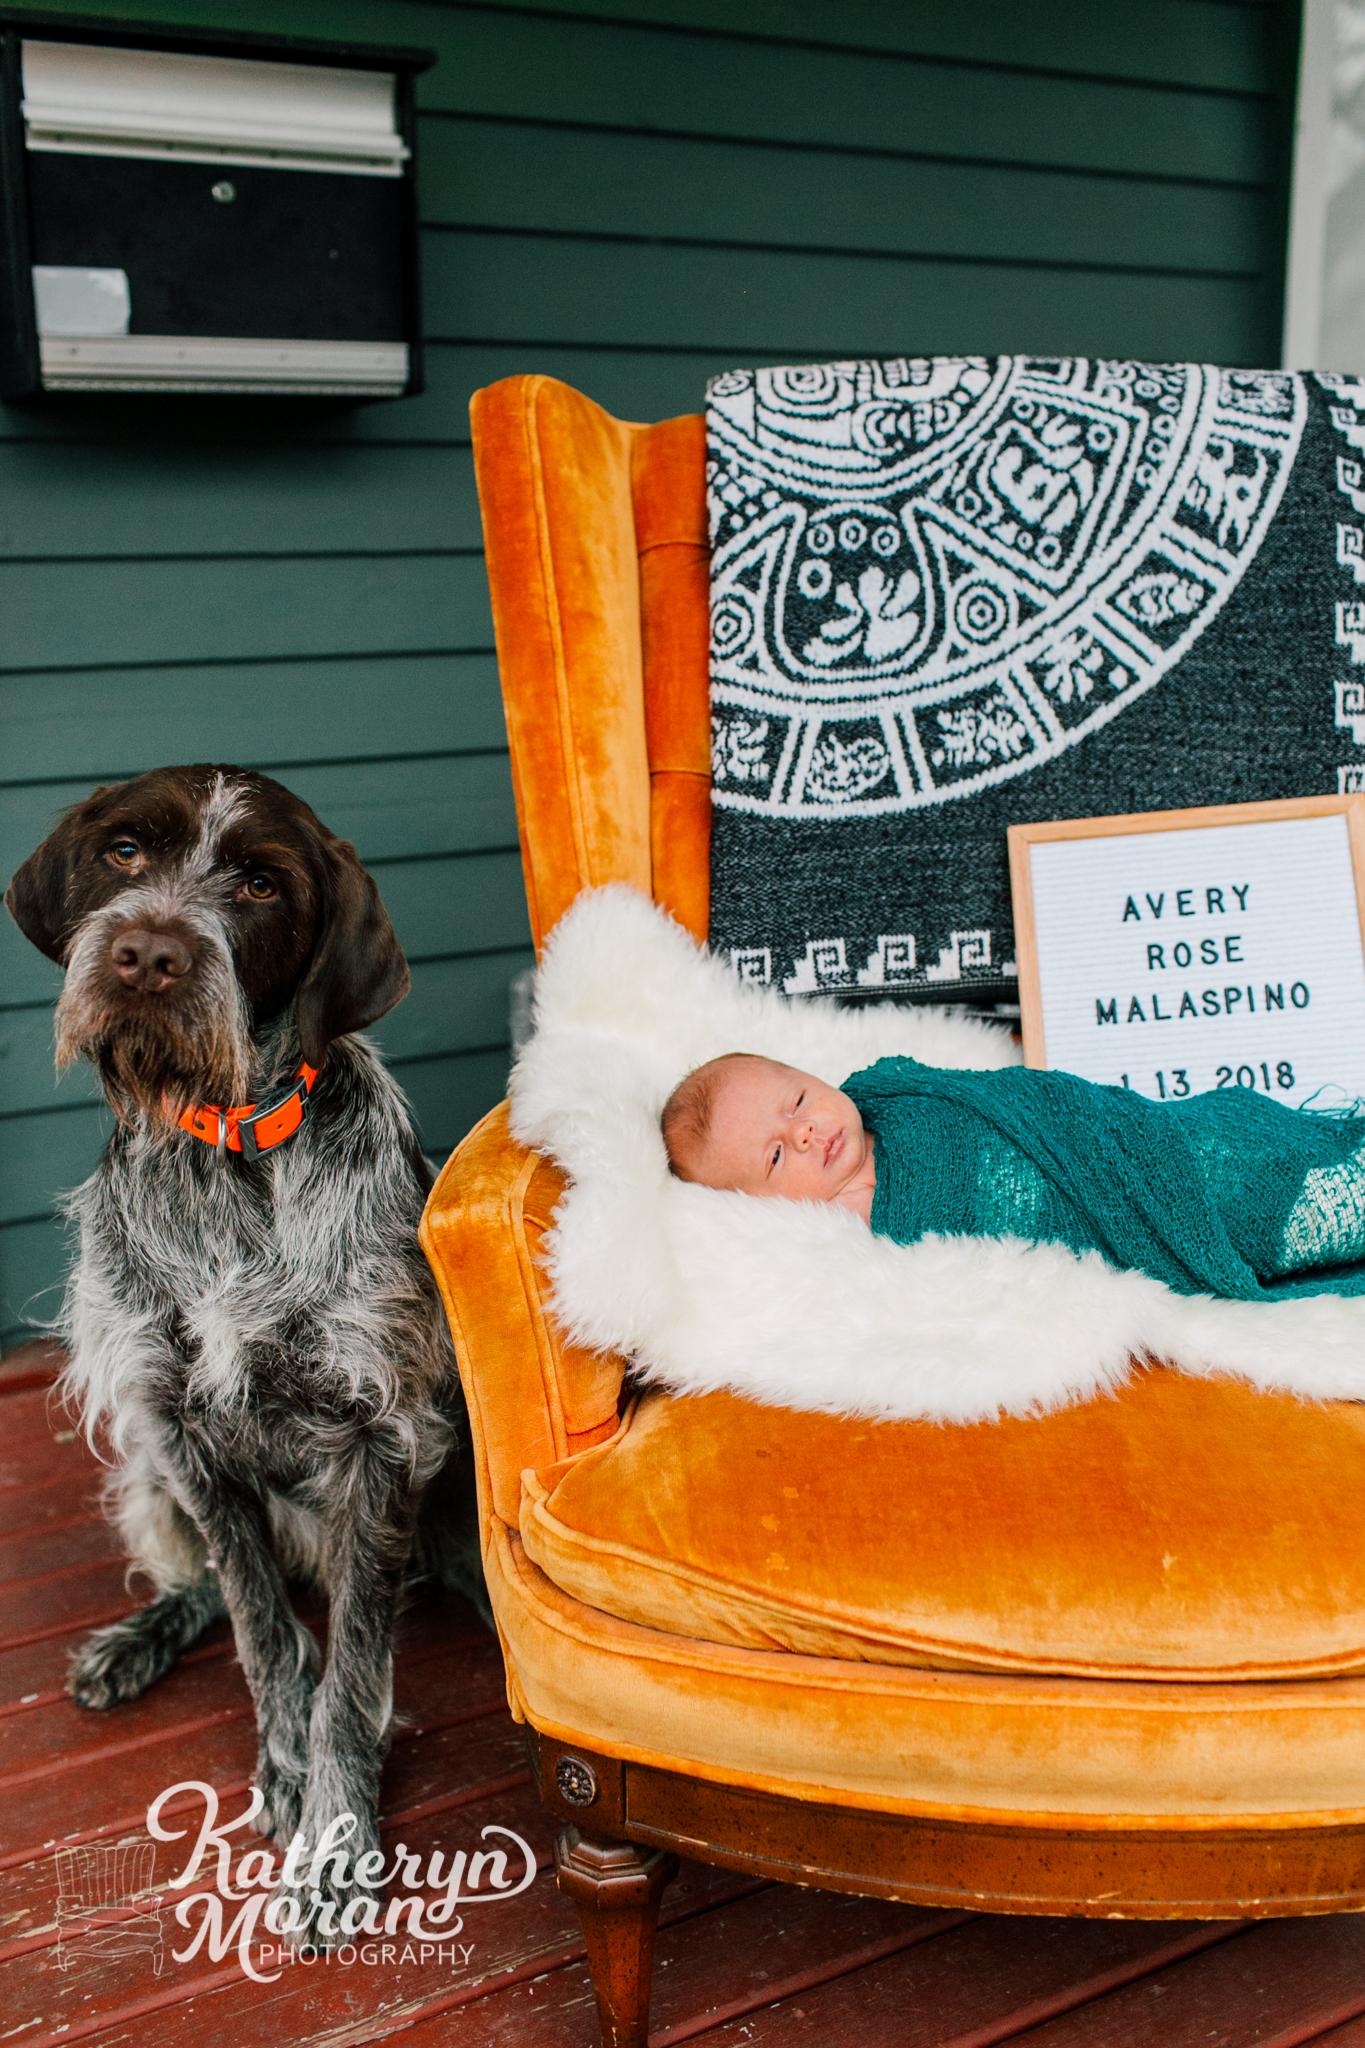 seattle-newborn-photographer-katheryn-moran-avery-malaspino-7.jpg